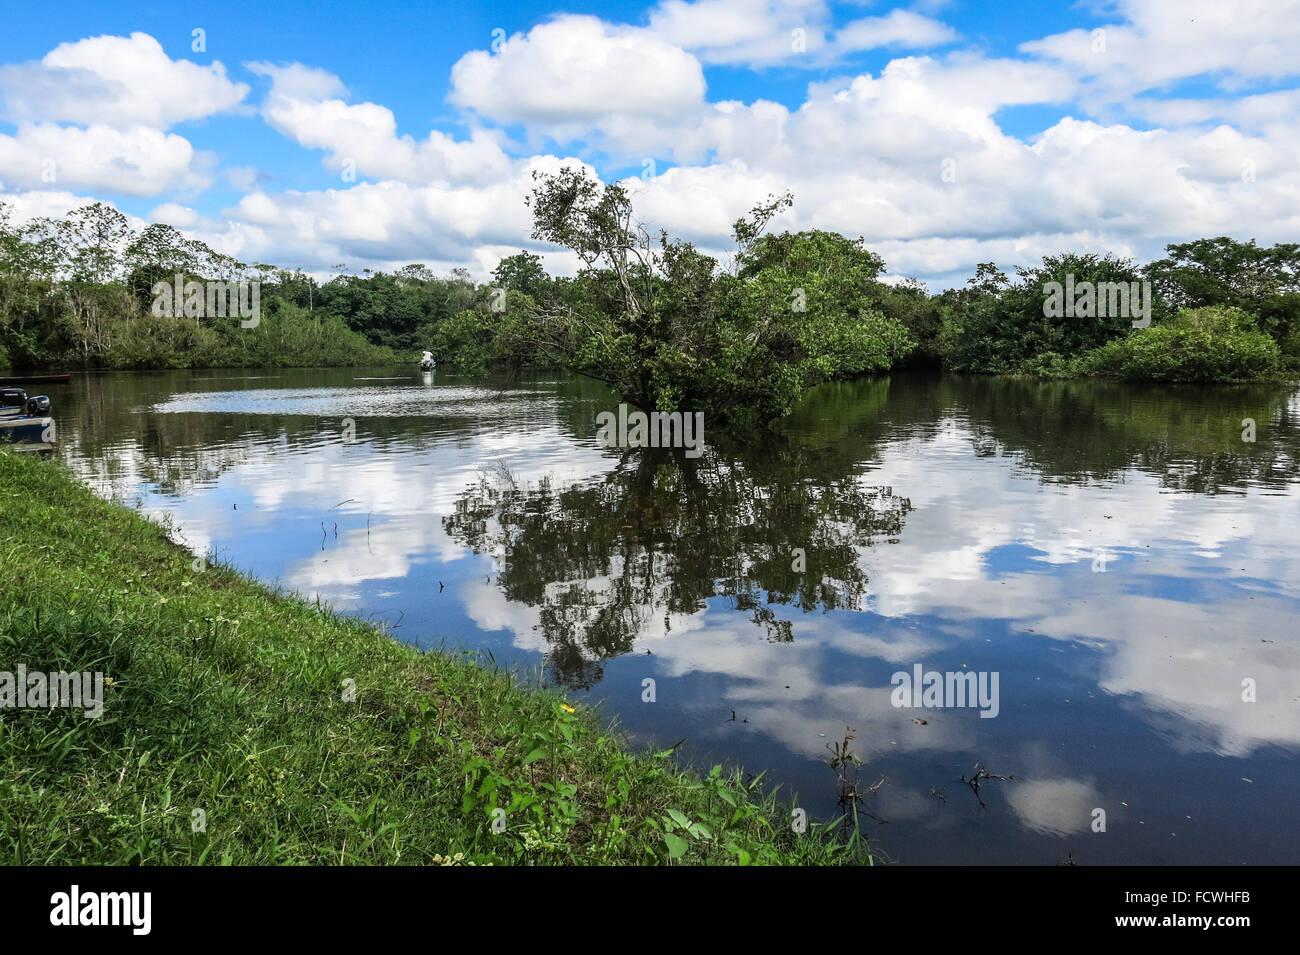 Yacuma river. Bolivian jungle. Amazon region - Stock Image